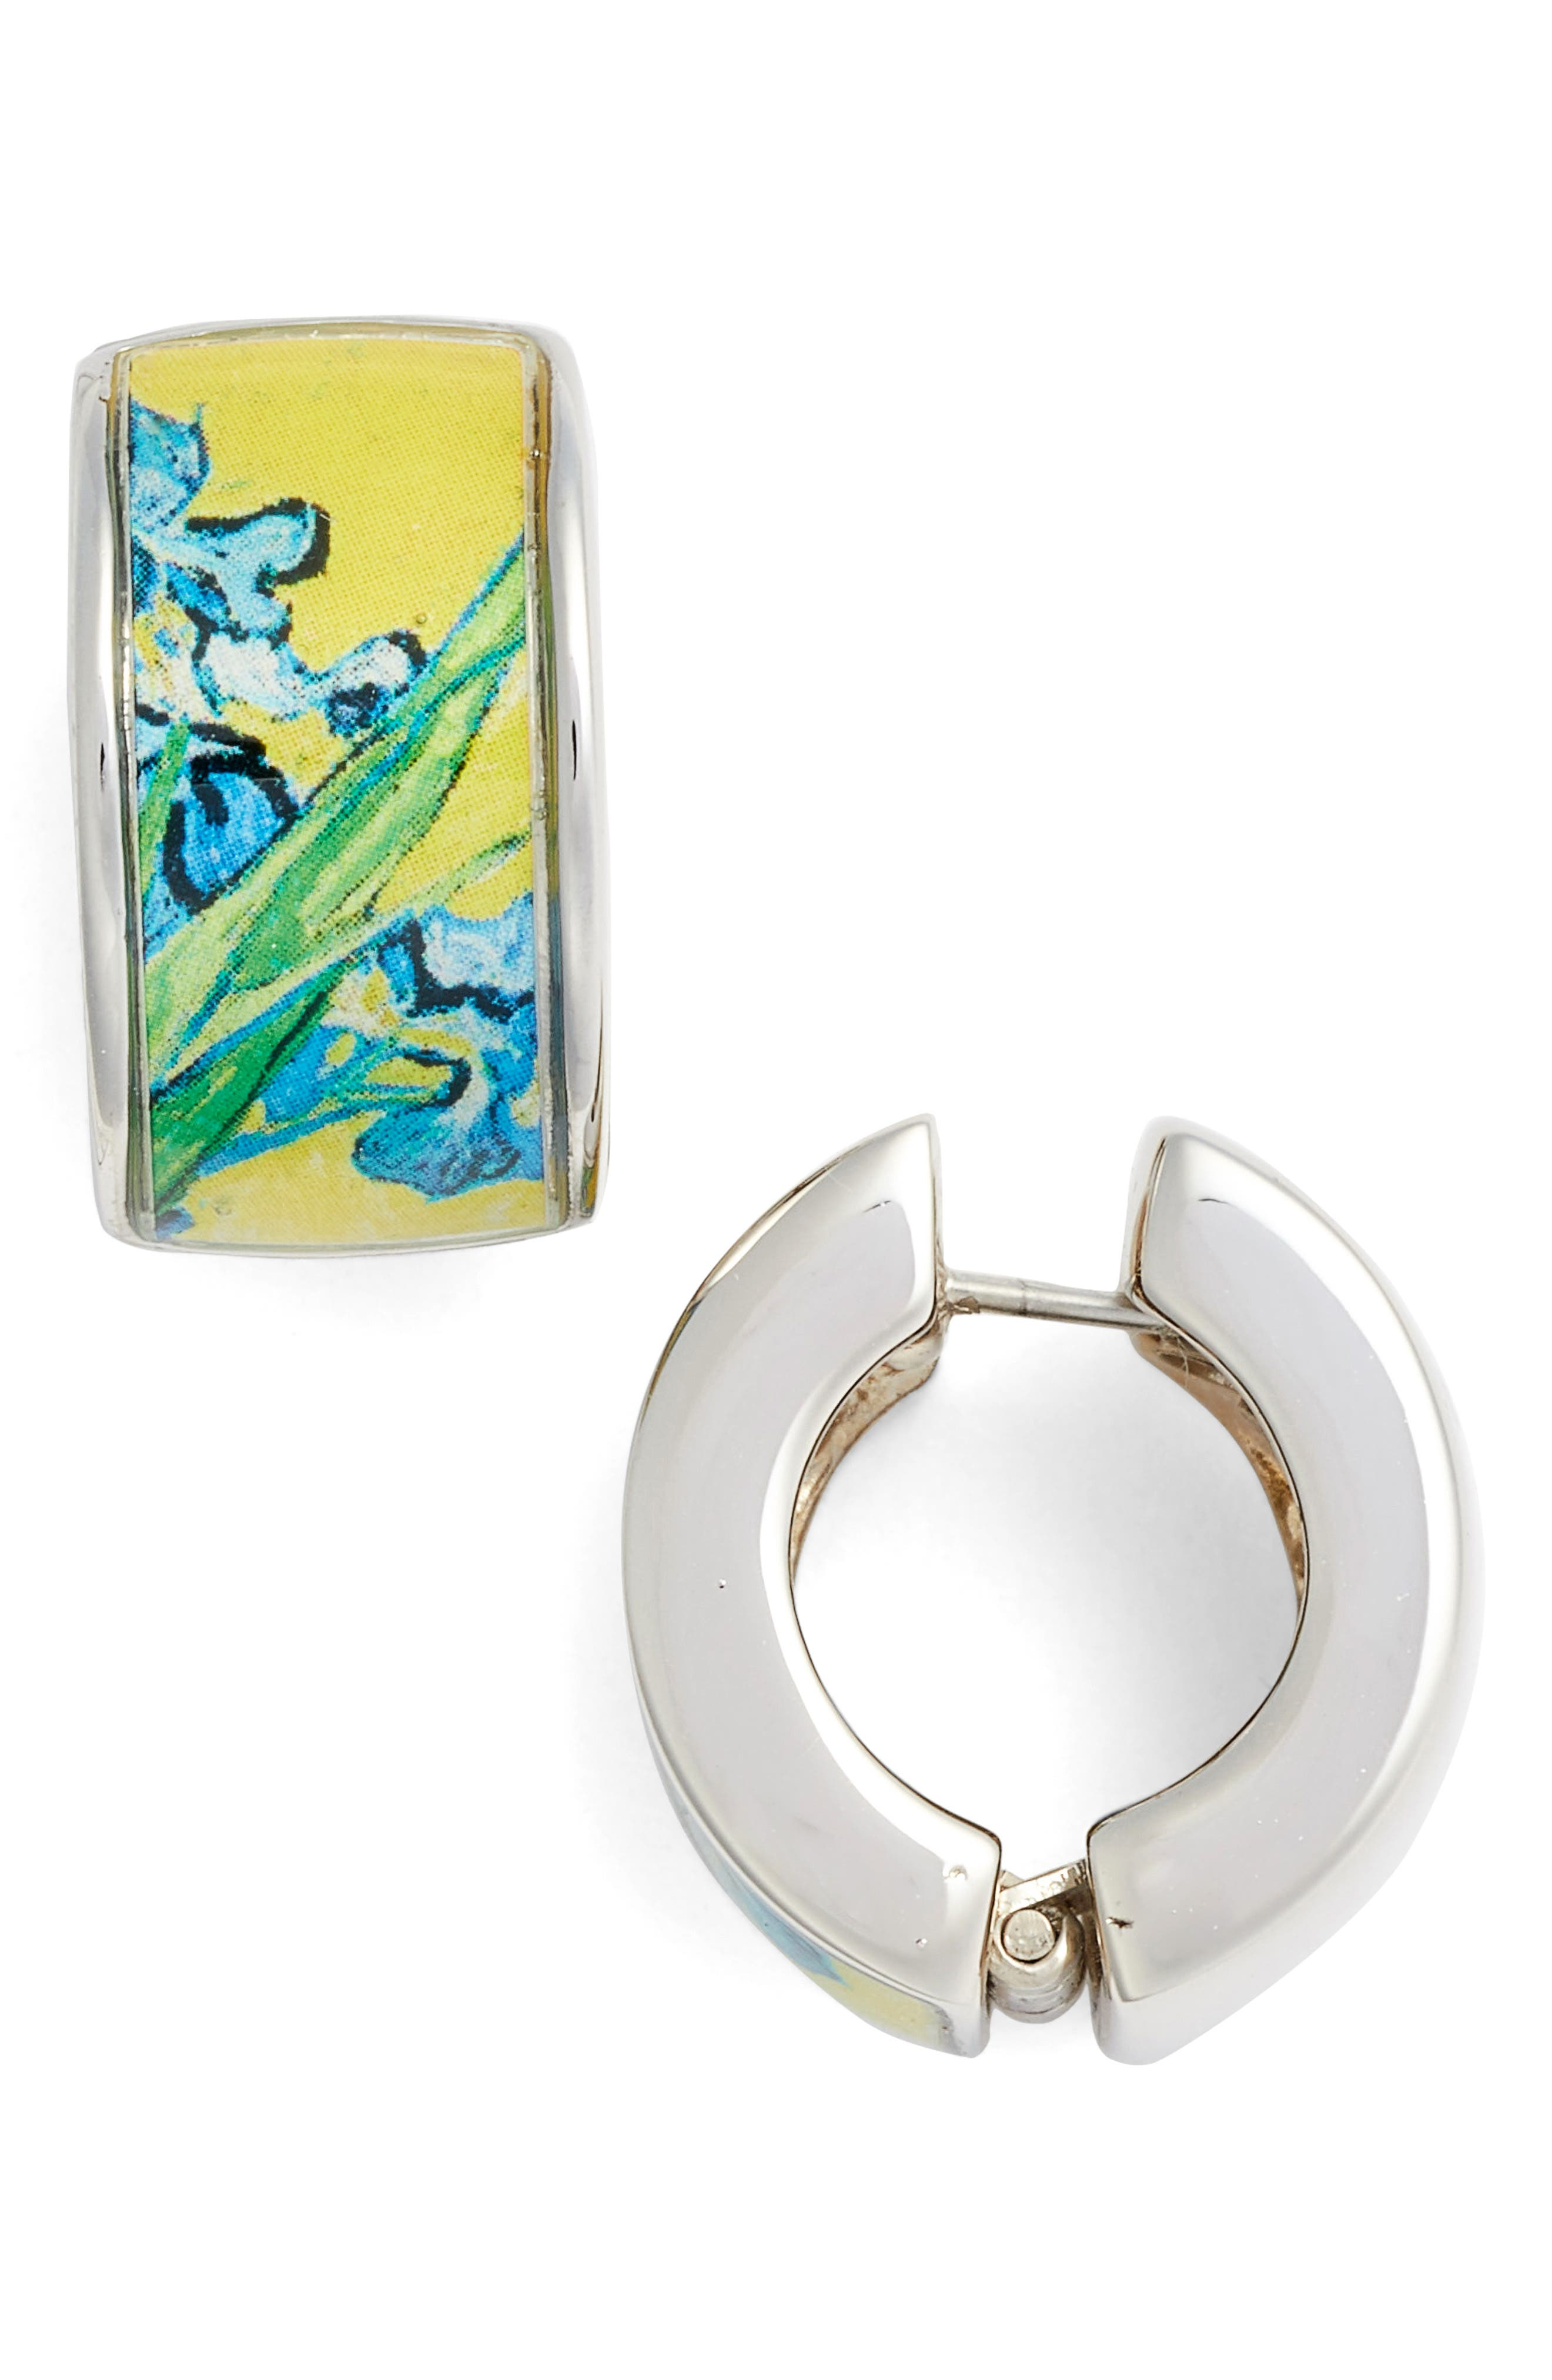 Silvertone Irises Earrings,                             Main thumbnail 1, color,                             Blue/ Silver